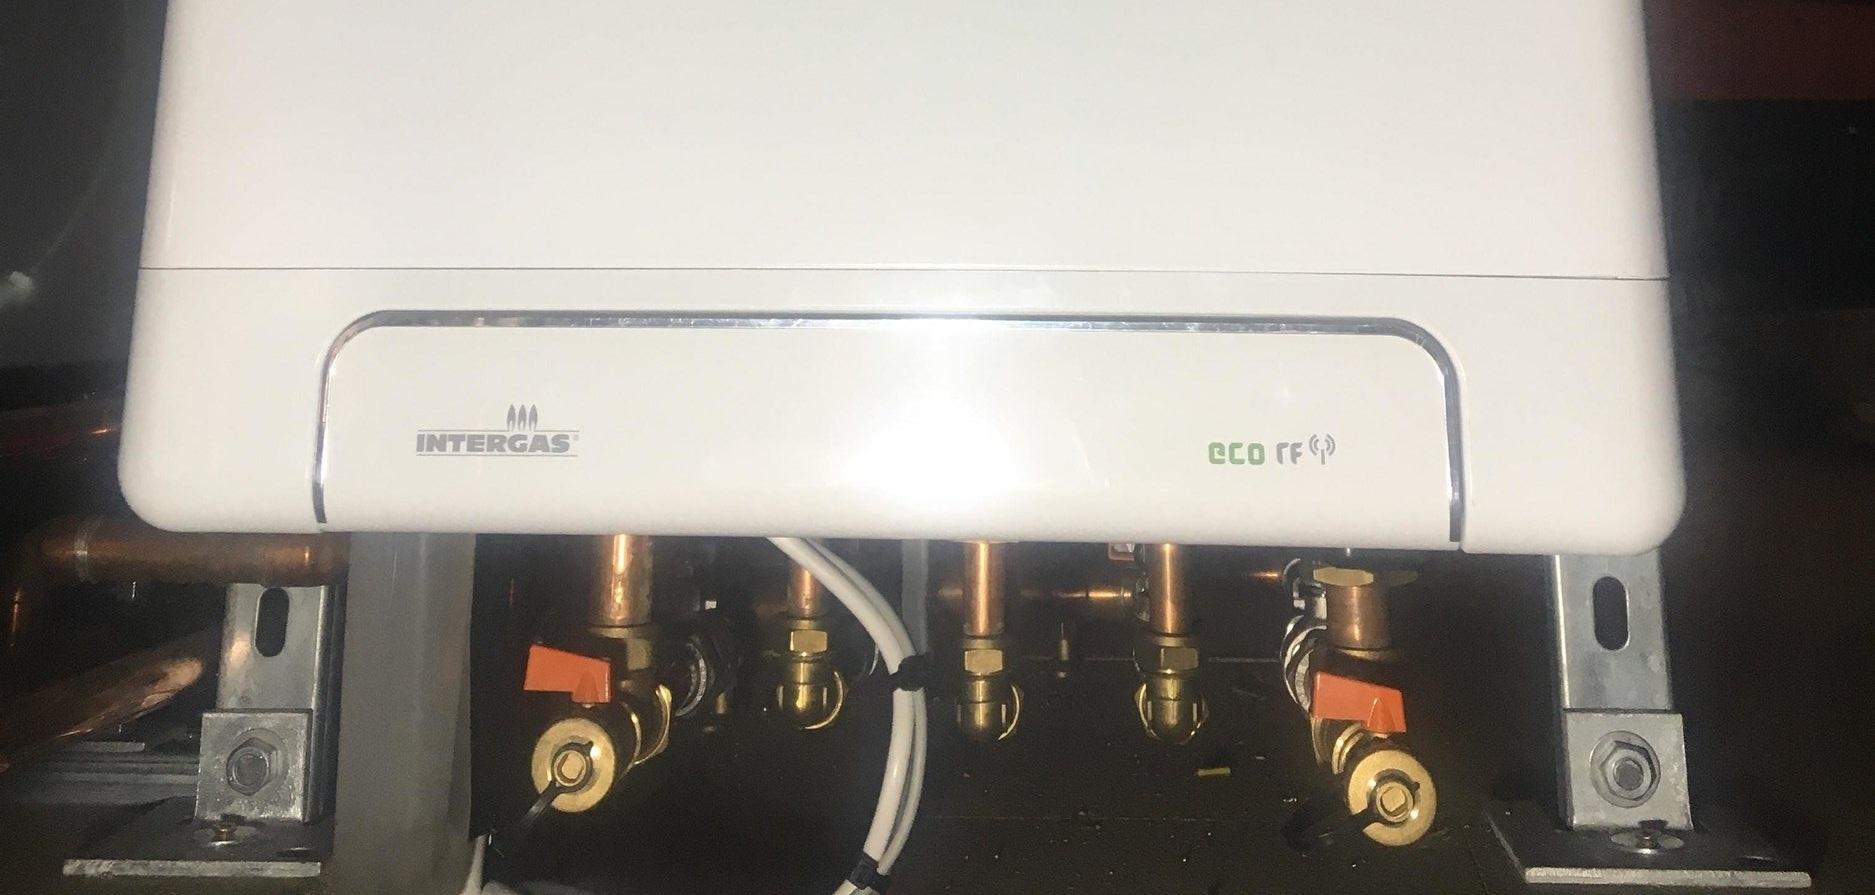 Dan Poulson - Intergas Eco RF36.JPG